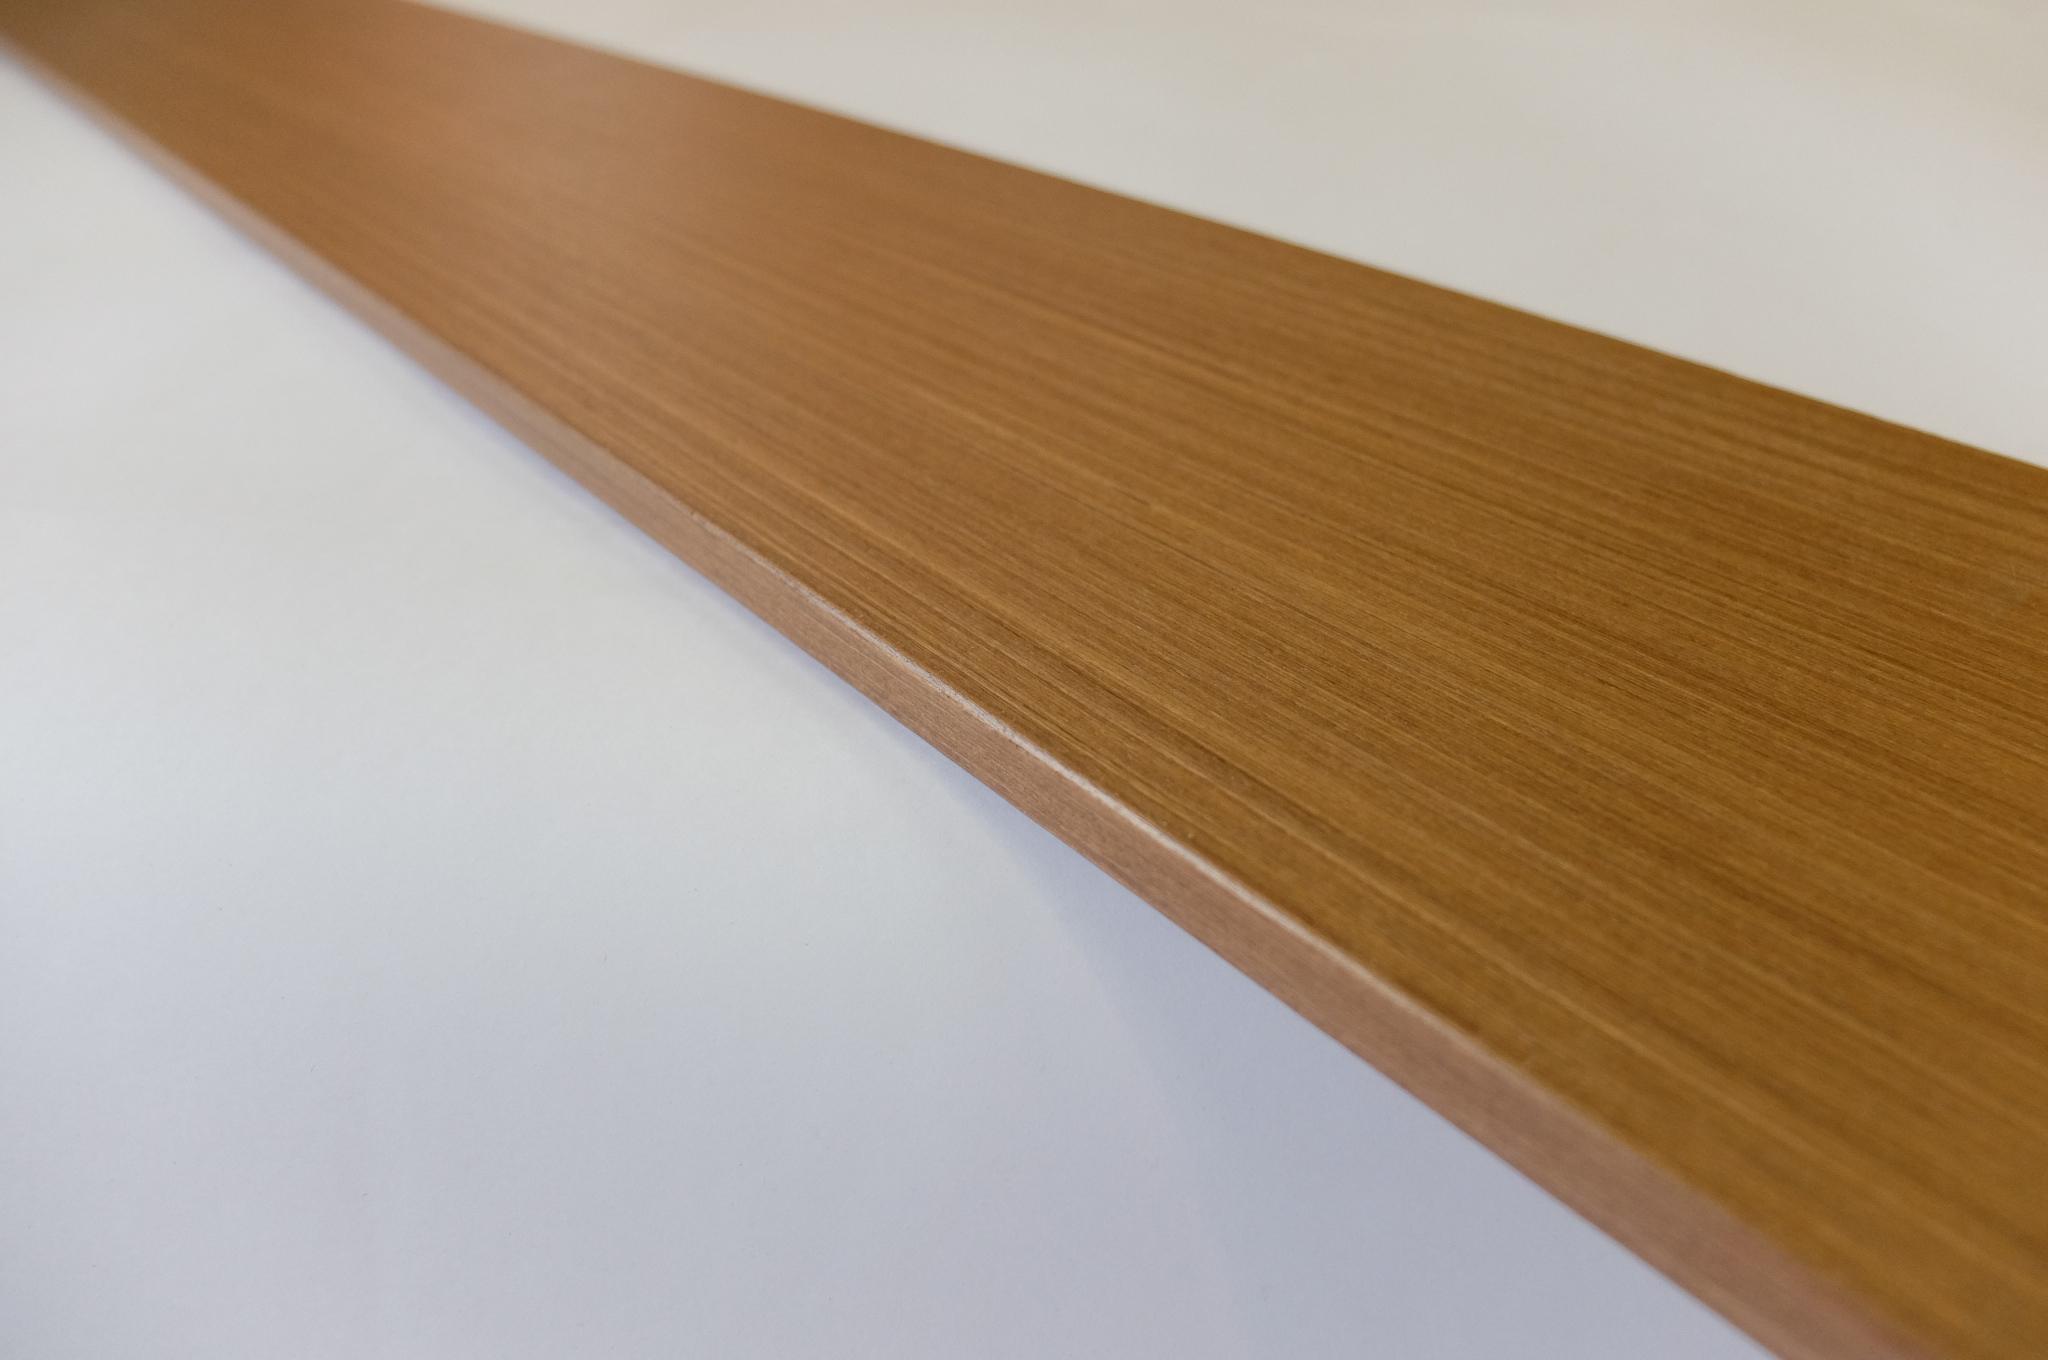 Стойка доборной планки шпон ореха (150х2100х10)